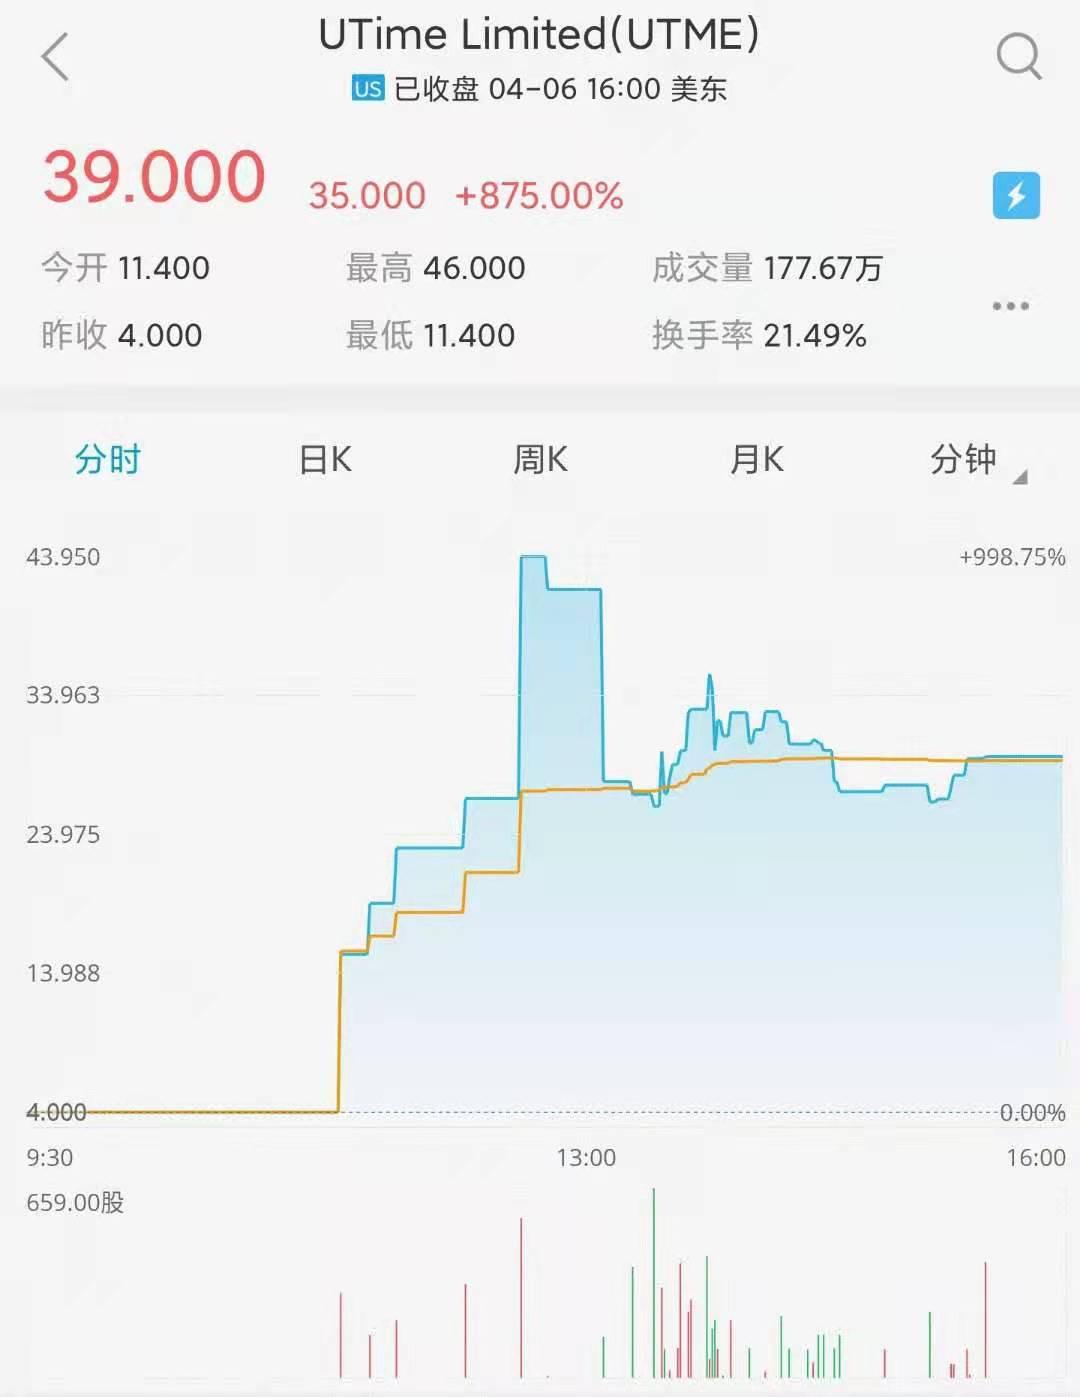 UTME首日上市分时图.jpg